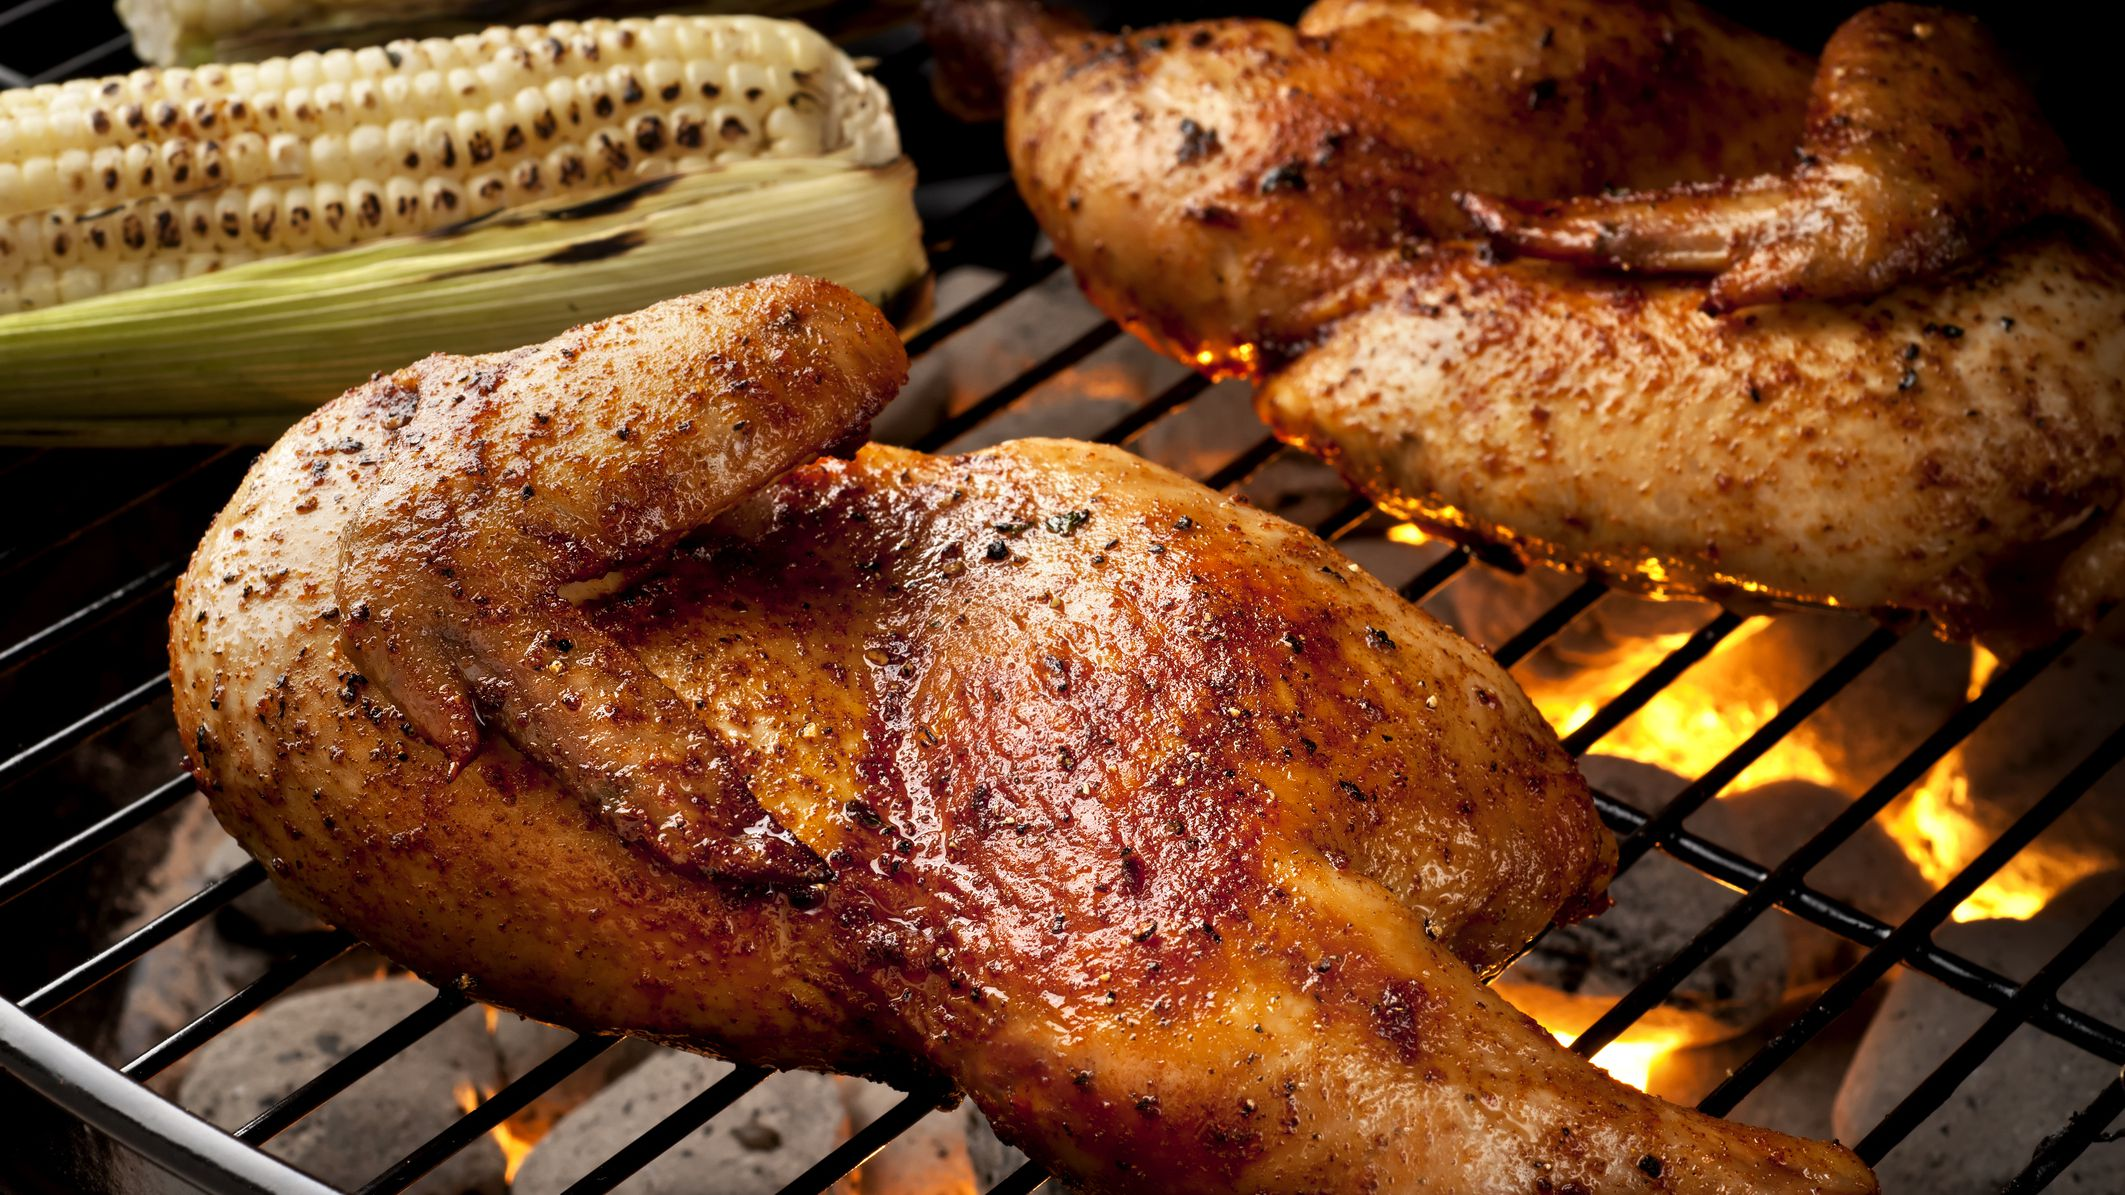 chicken grill ile ilgili görsel sonucu